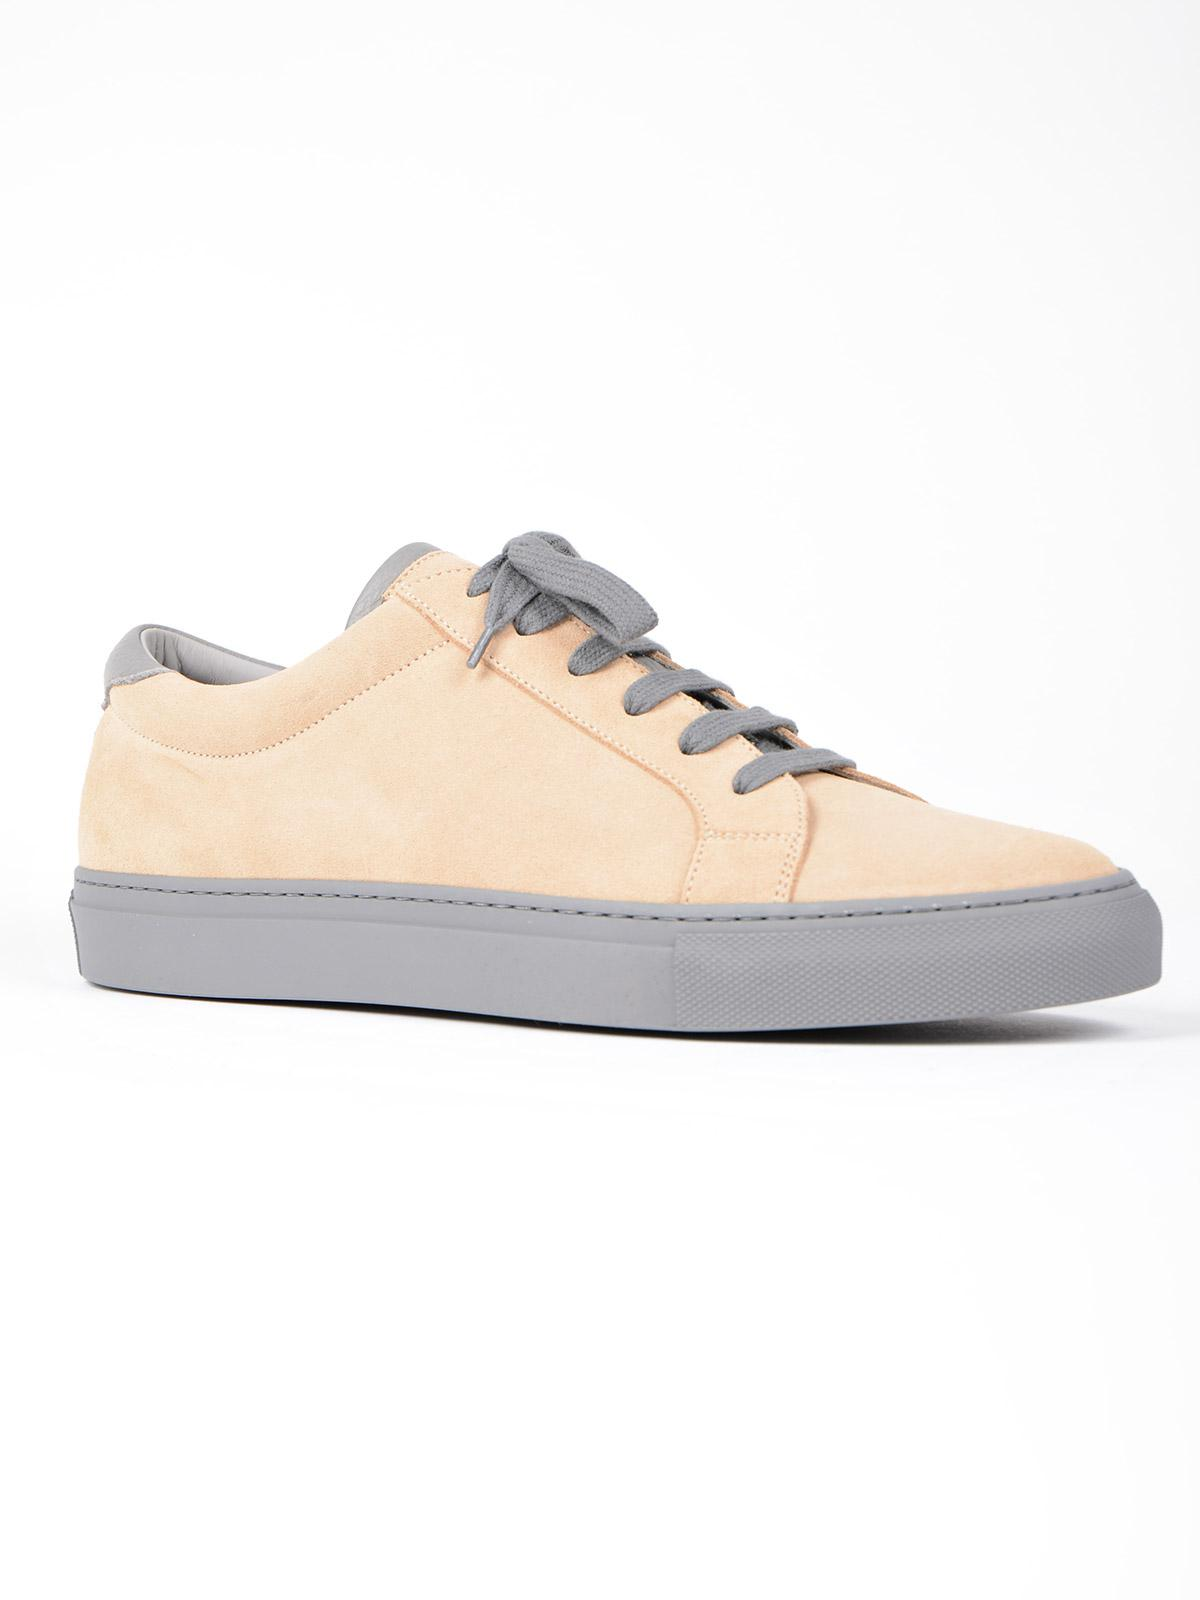 Brunello cucinelli Sneaker for Men   Lyst 558dd9e667